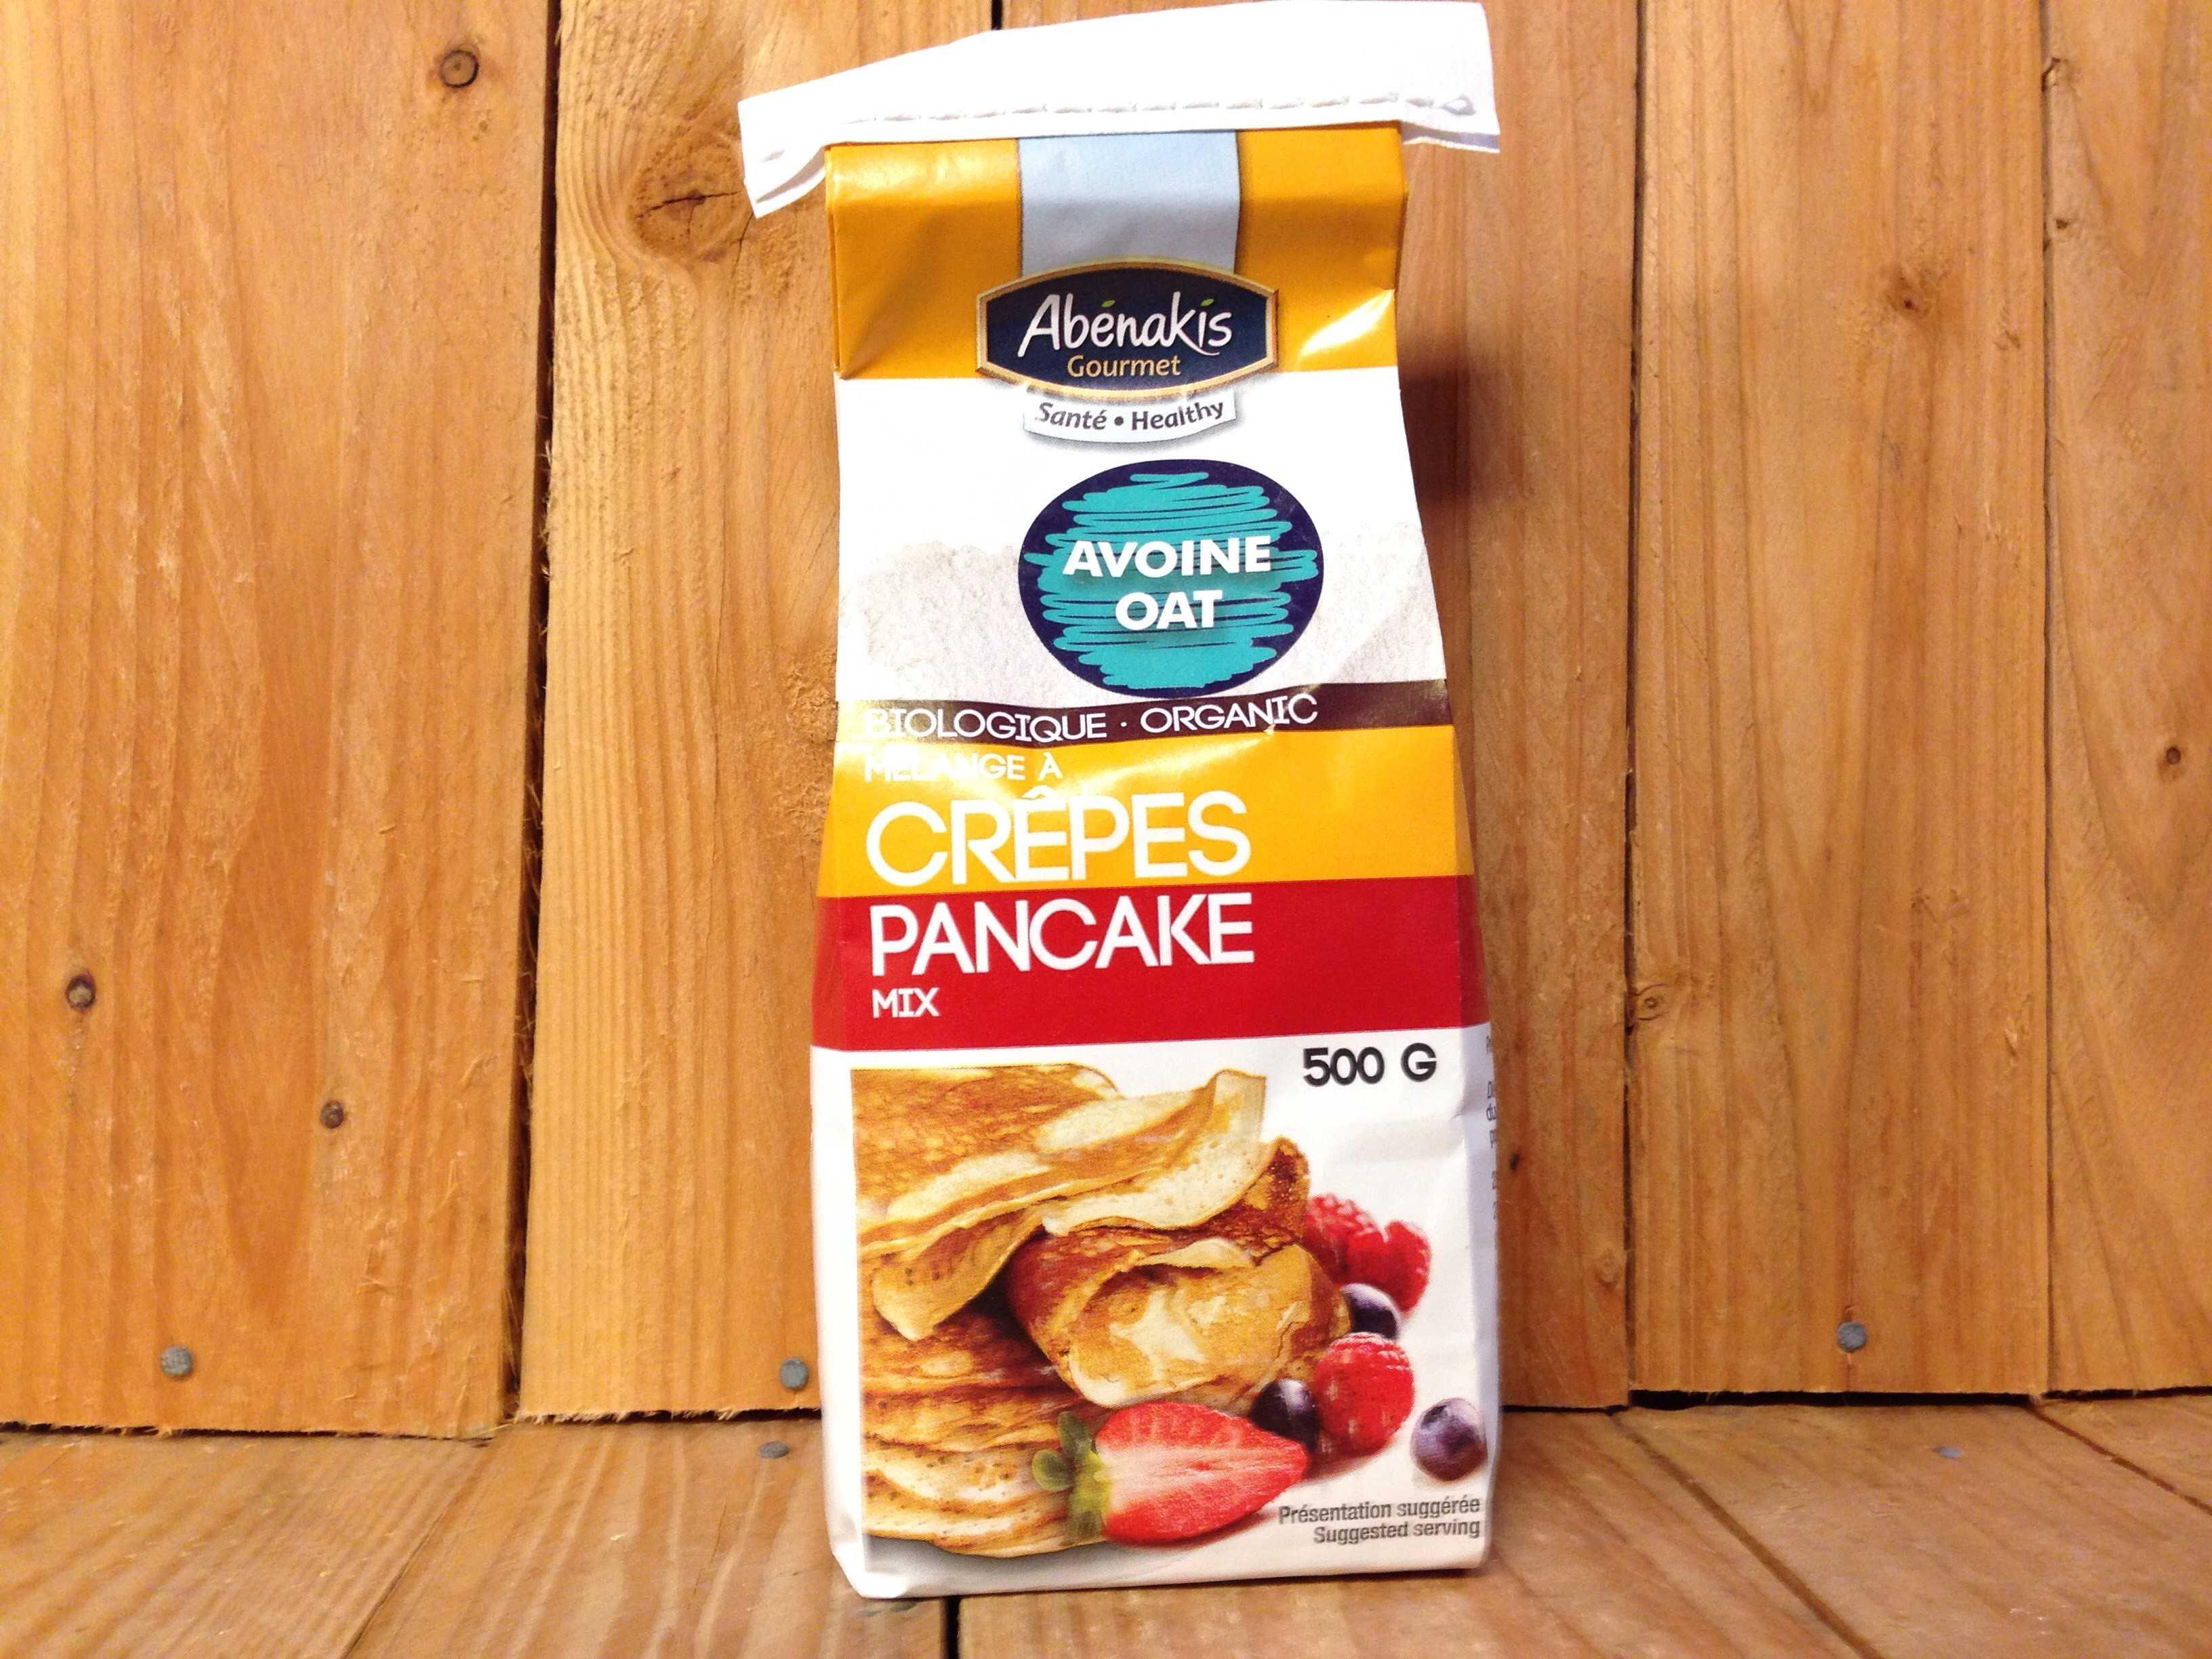 Abénakis – Pancake Mix – Oat (500g)